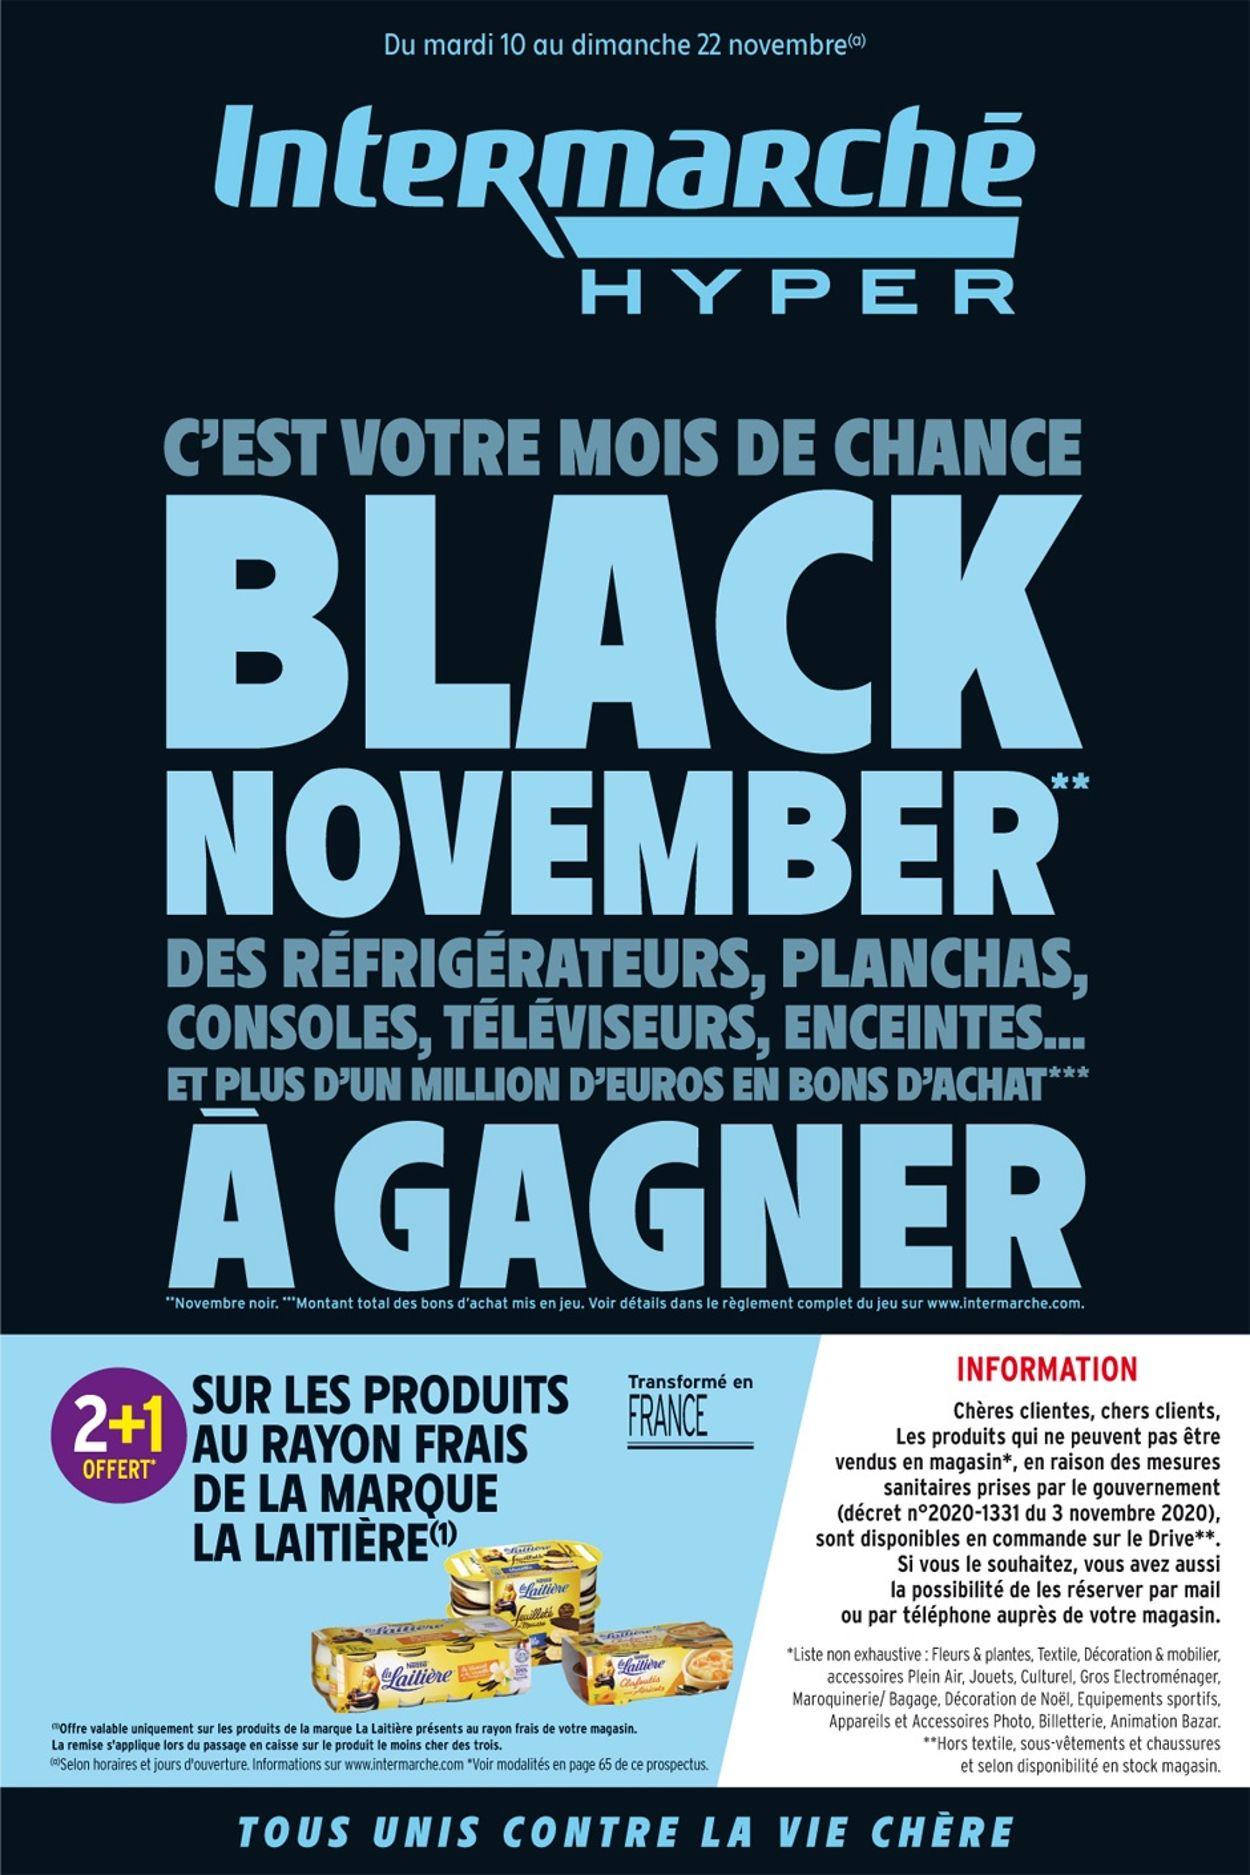 Intermarché Black Friday 2020 Catalogue - 10.11-22.11.2020